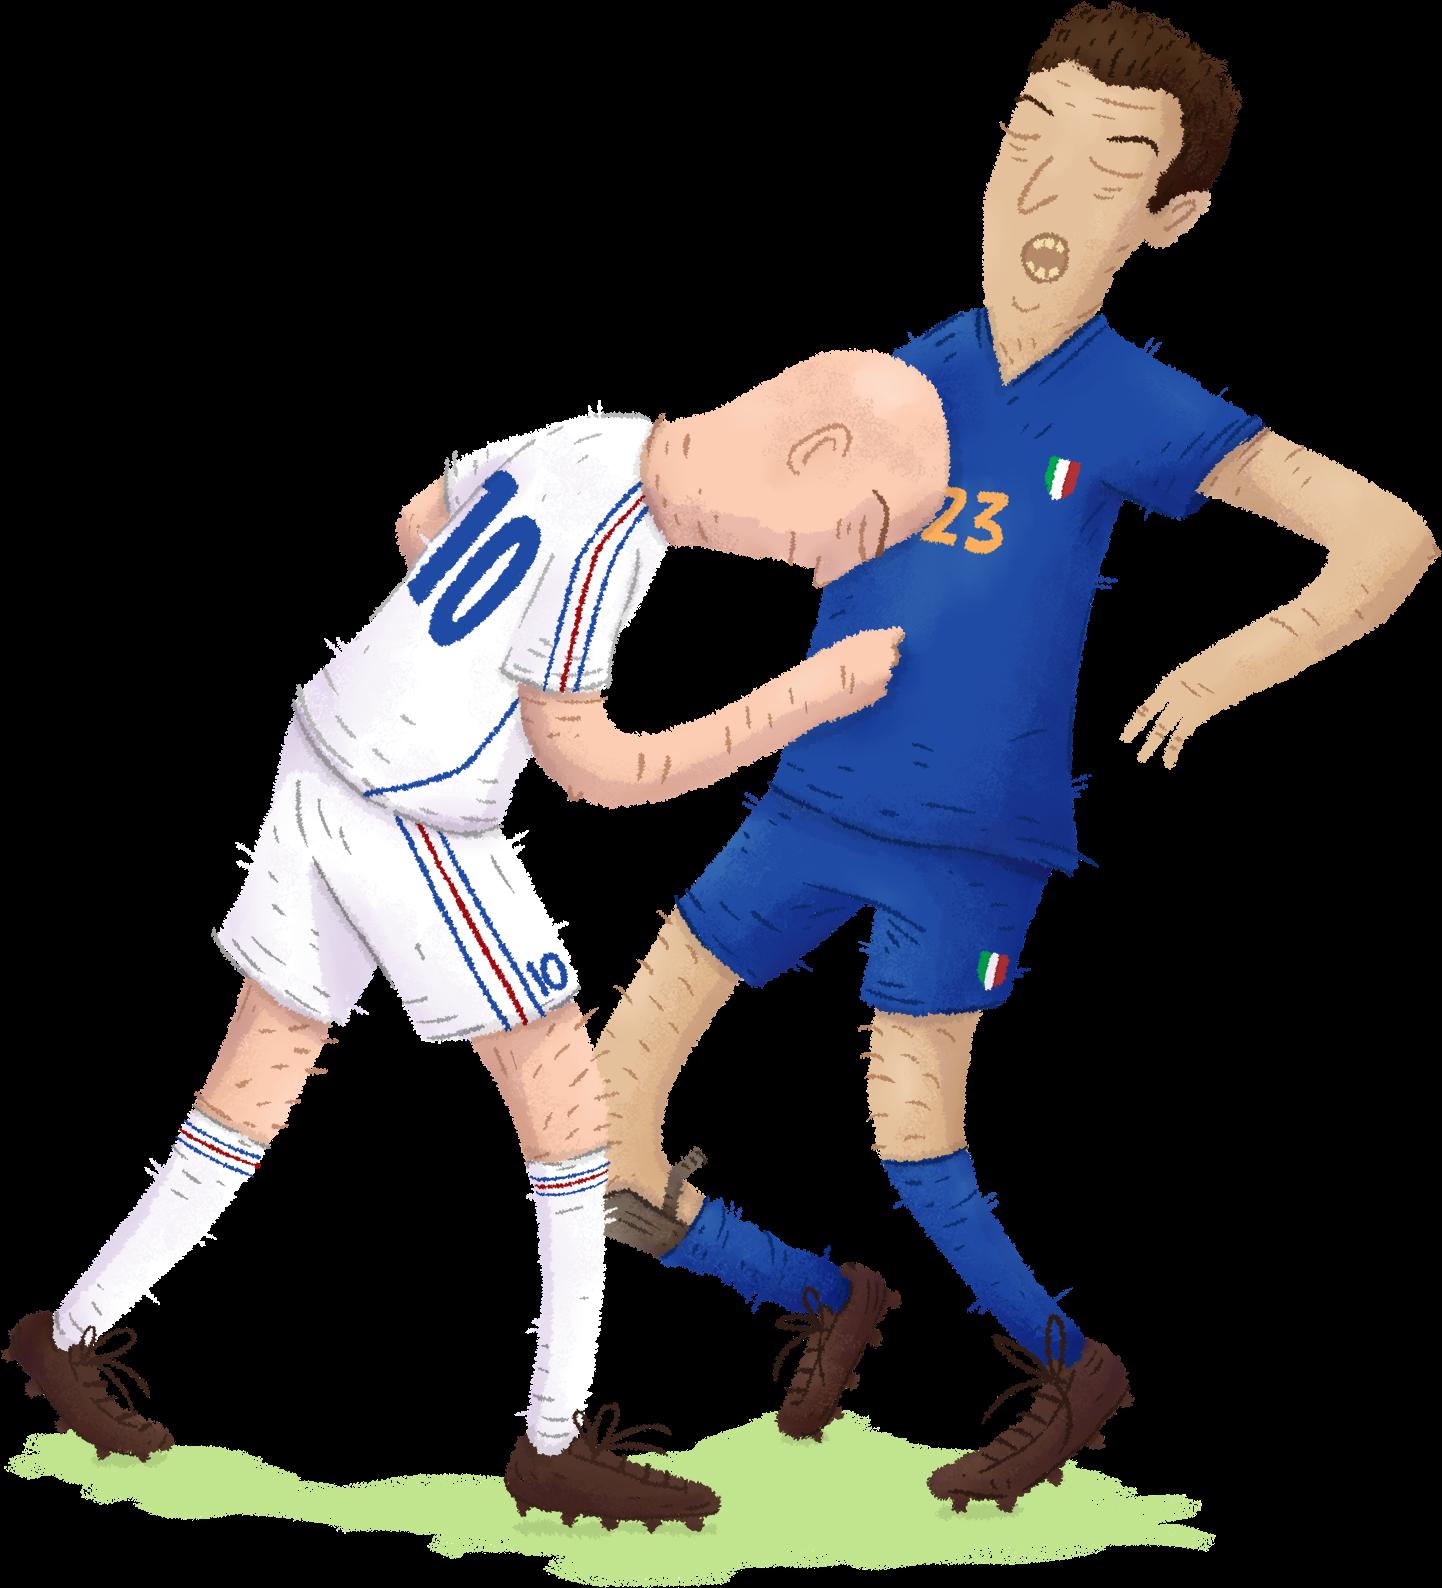 Download Zidane, France Materazzi, Italie - Zidane Materazzi Illustration -  Full Size PNG Image - PNGkit